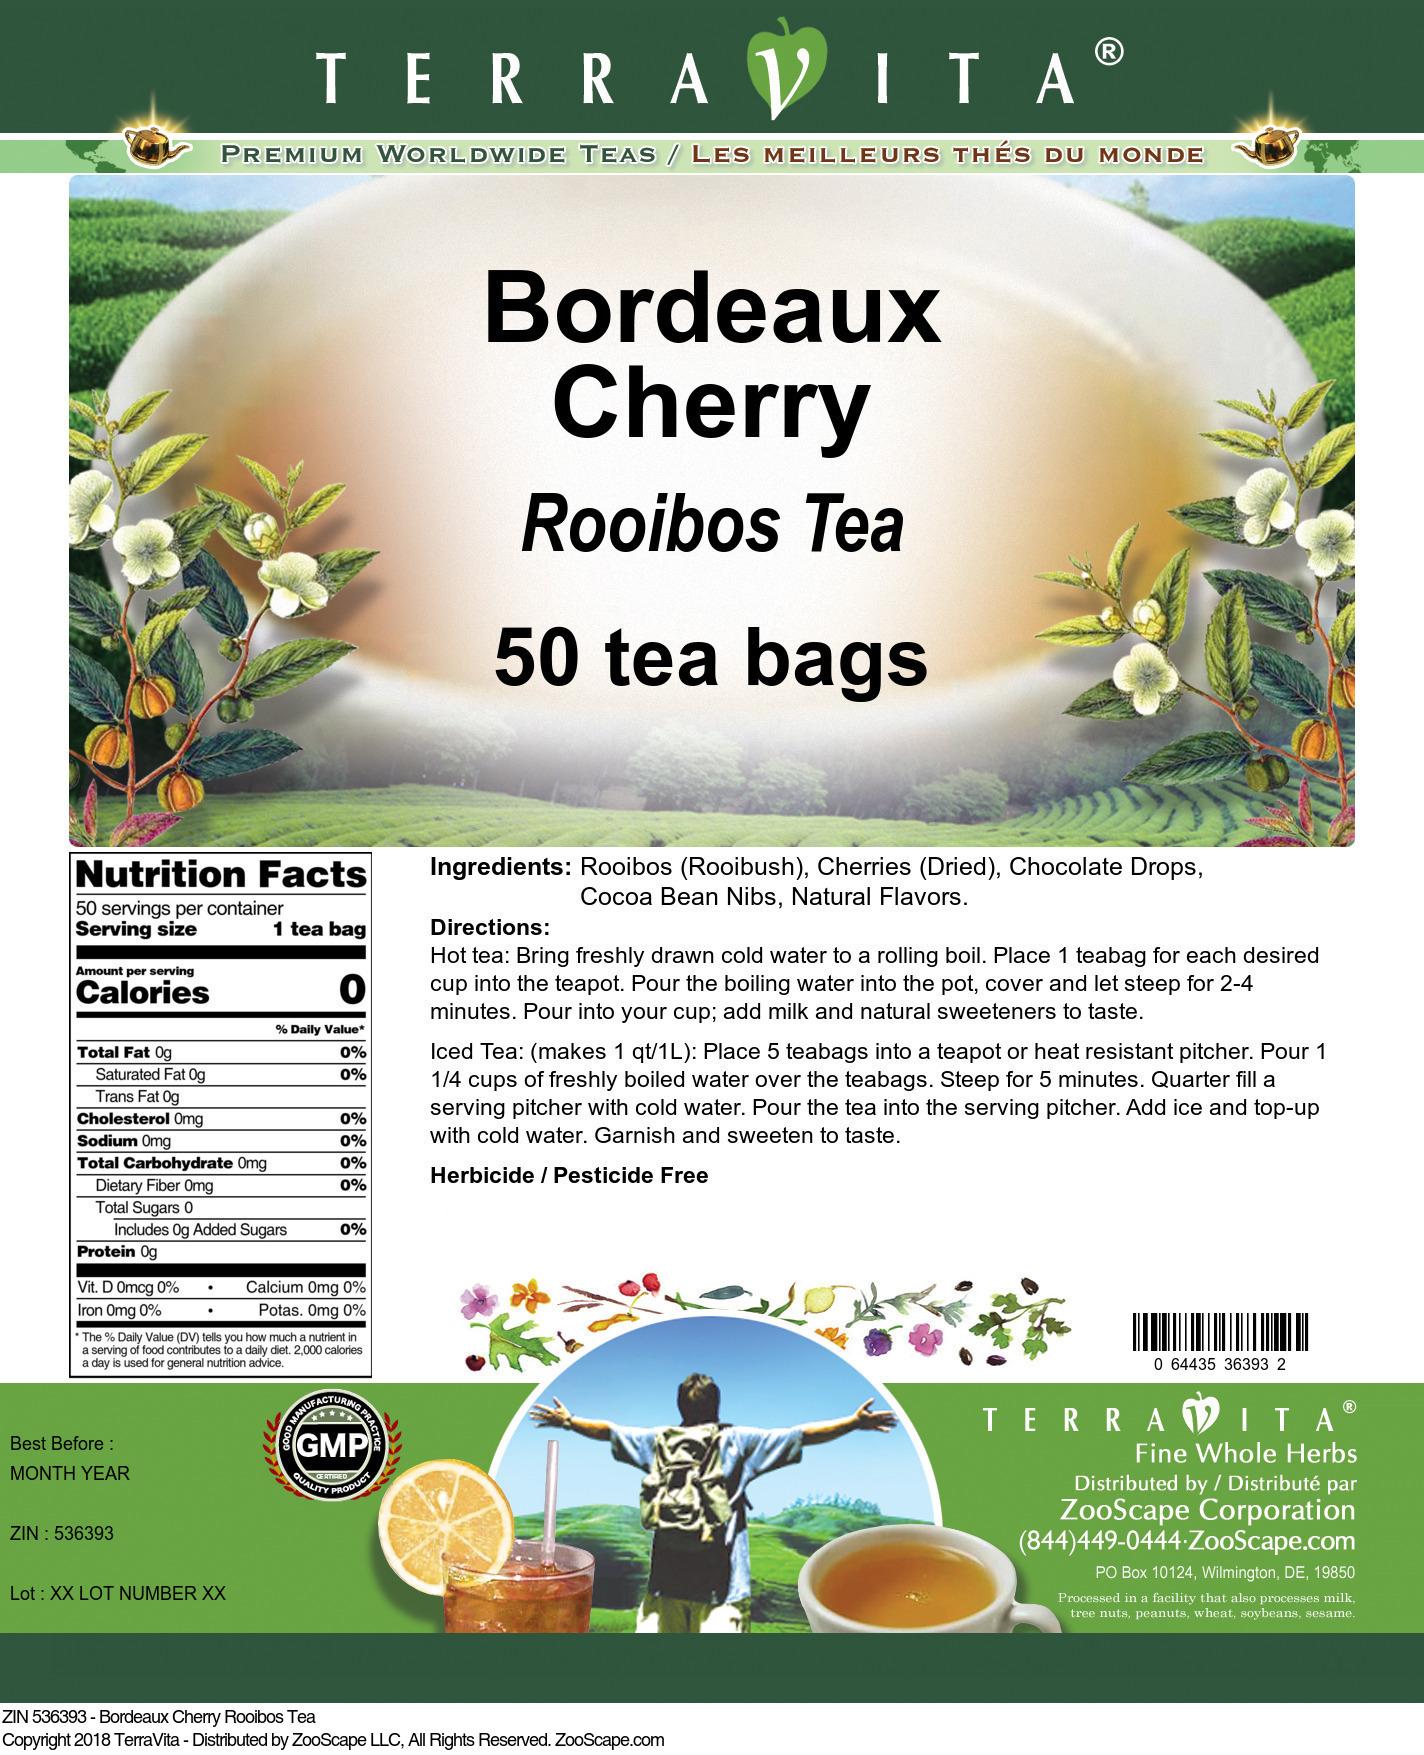 Bordeaux Cherry Rooibos Tea